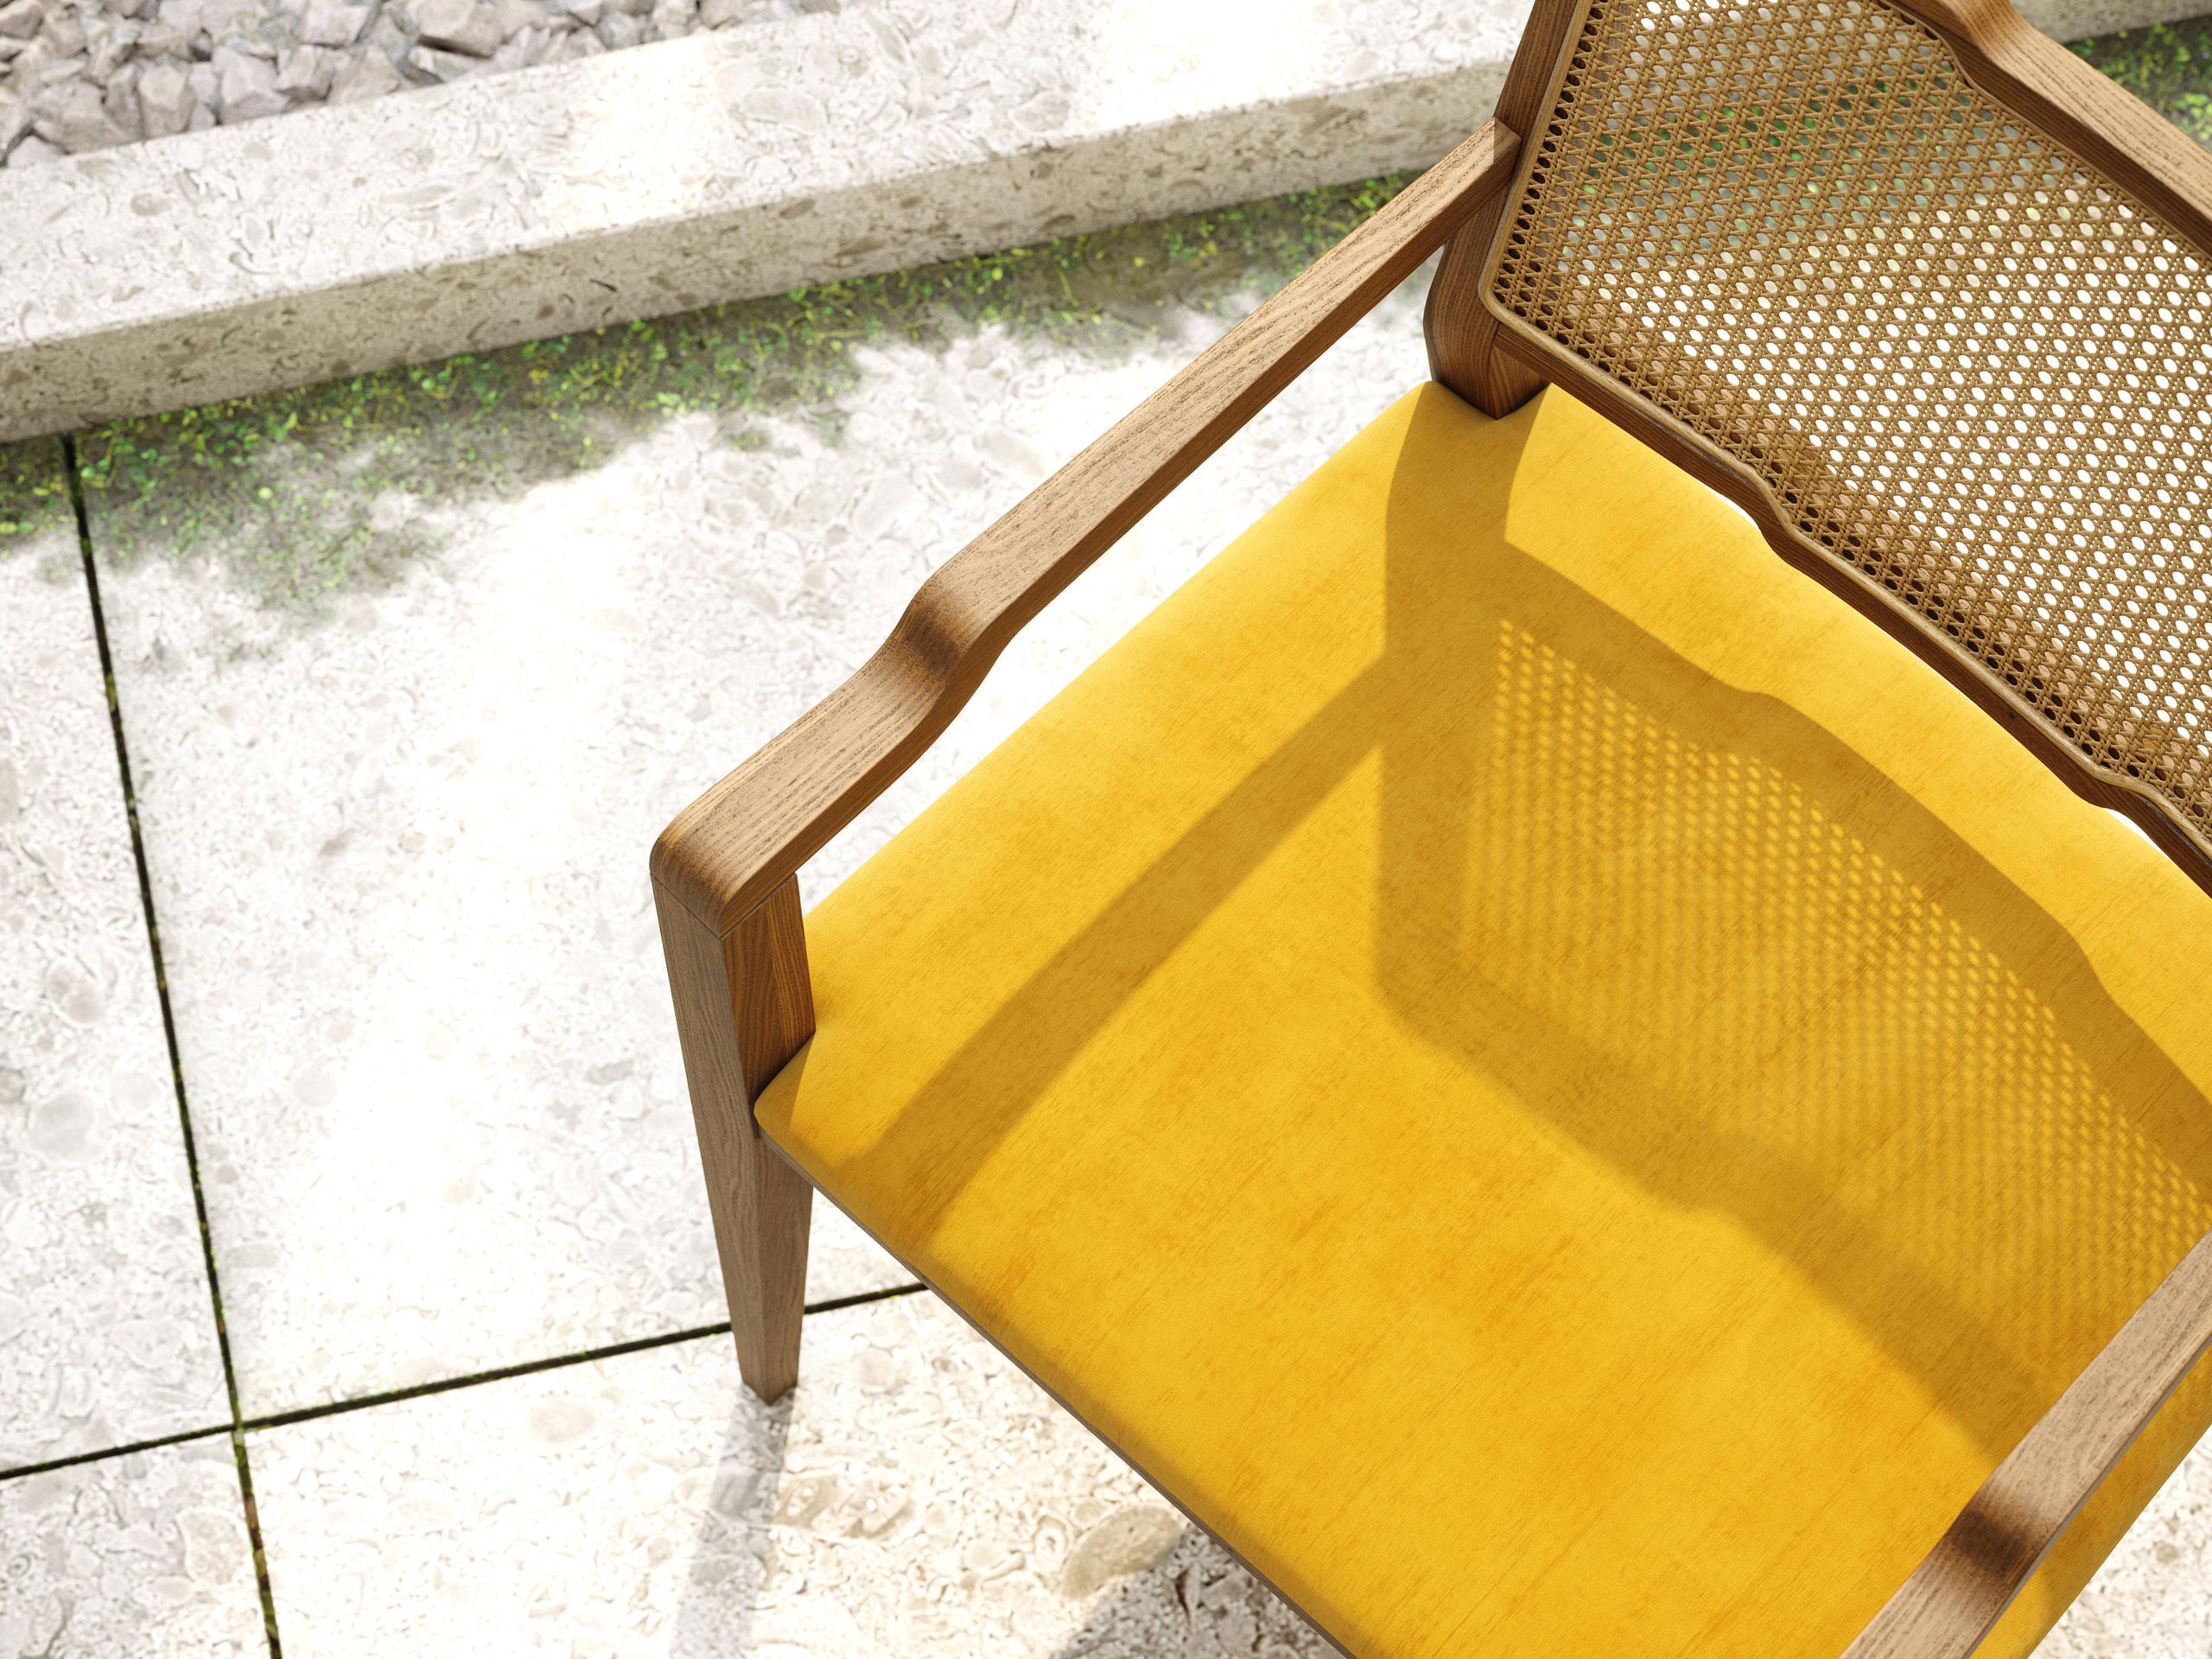 eva-chair-domkapa-new-collection-2021-2